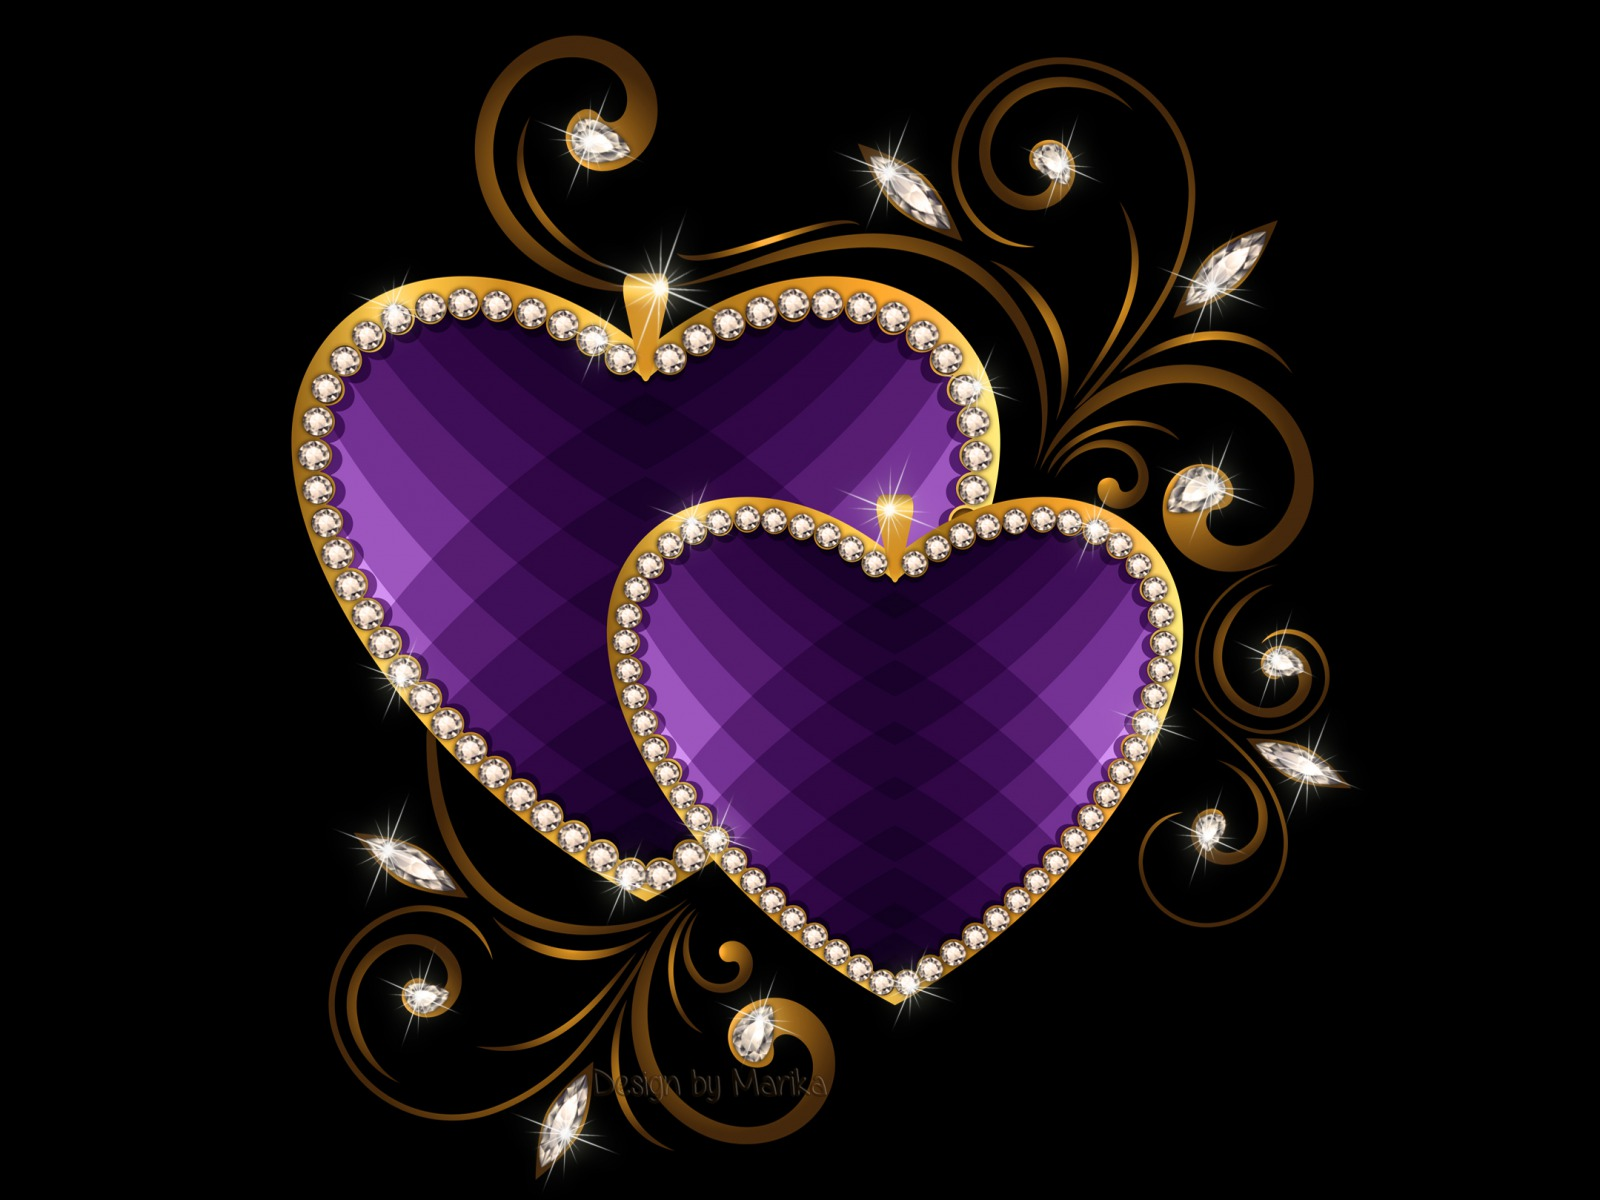 Purple And Black Hearts Wallpaper: Purple Hearts Wallpaper And Hintergrund